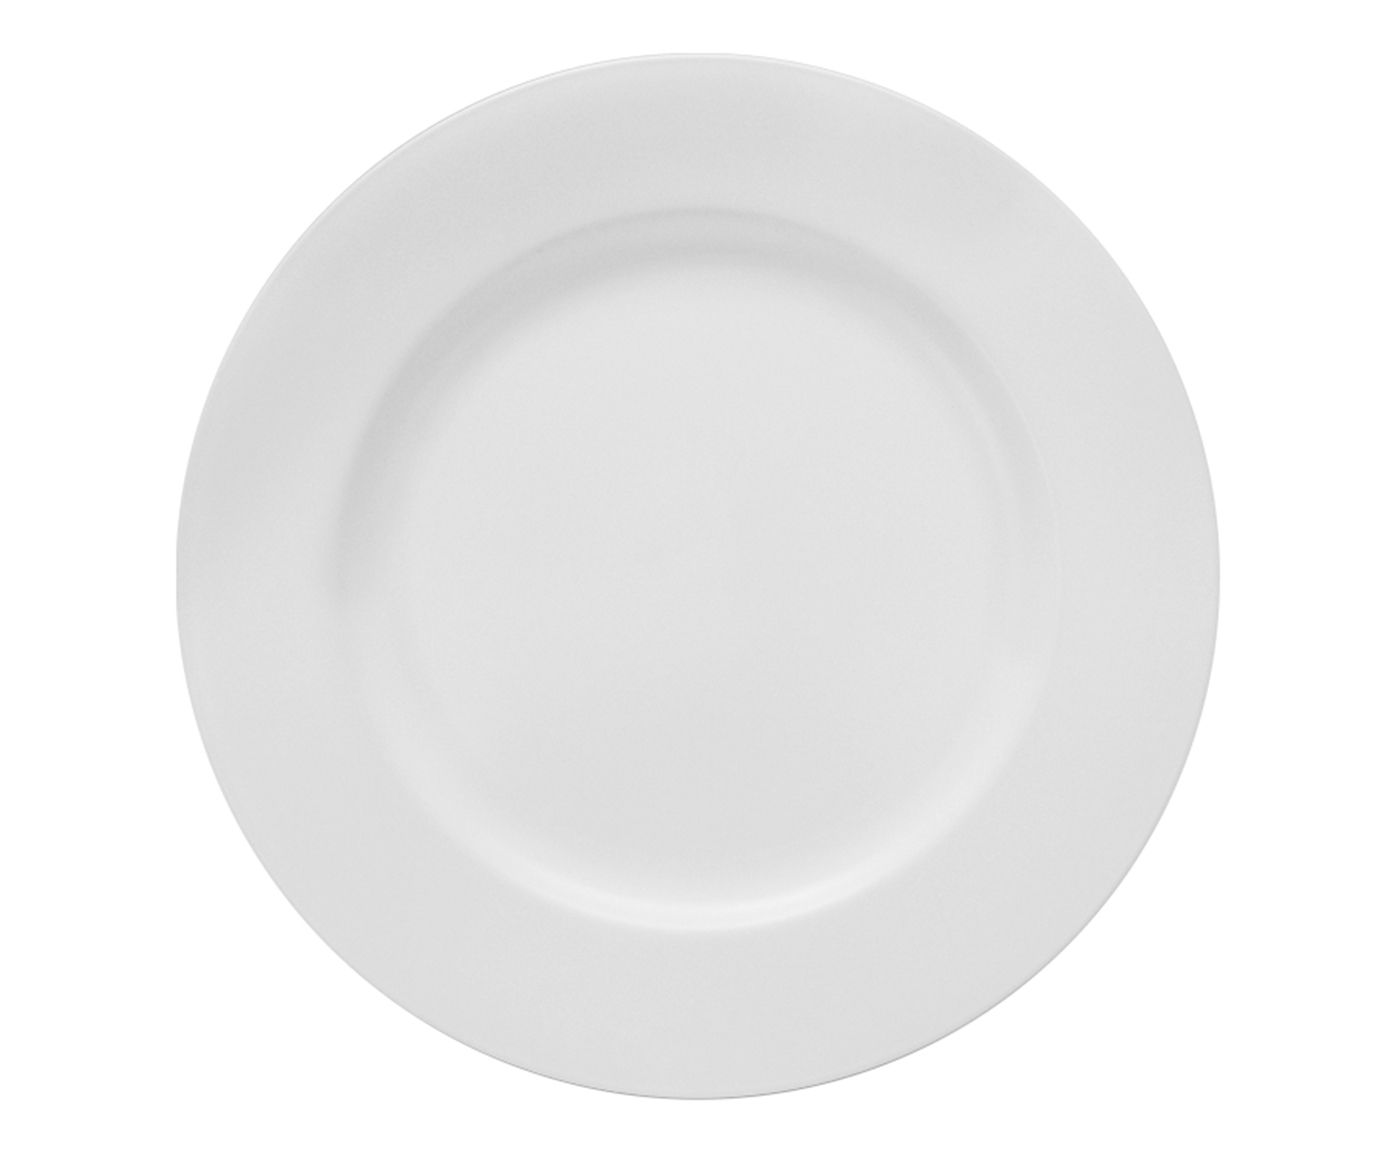 Sousplat Chá Off White - 30cm | Westwing.com.br